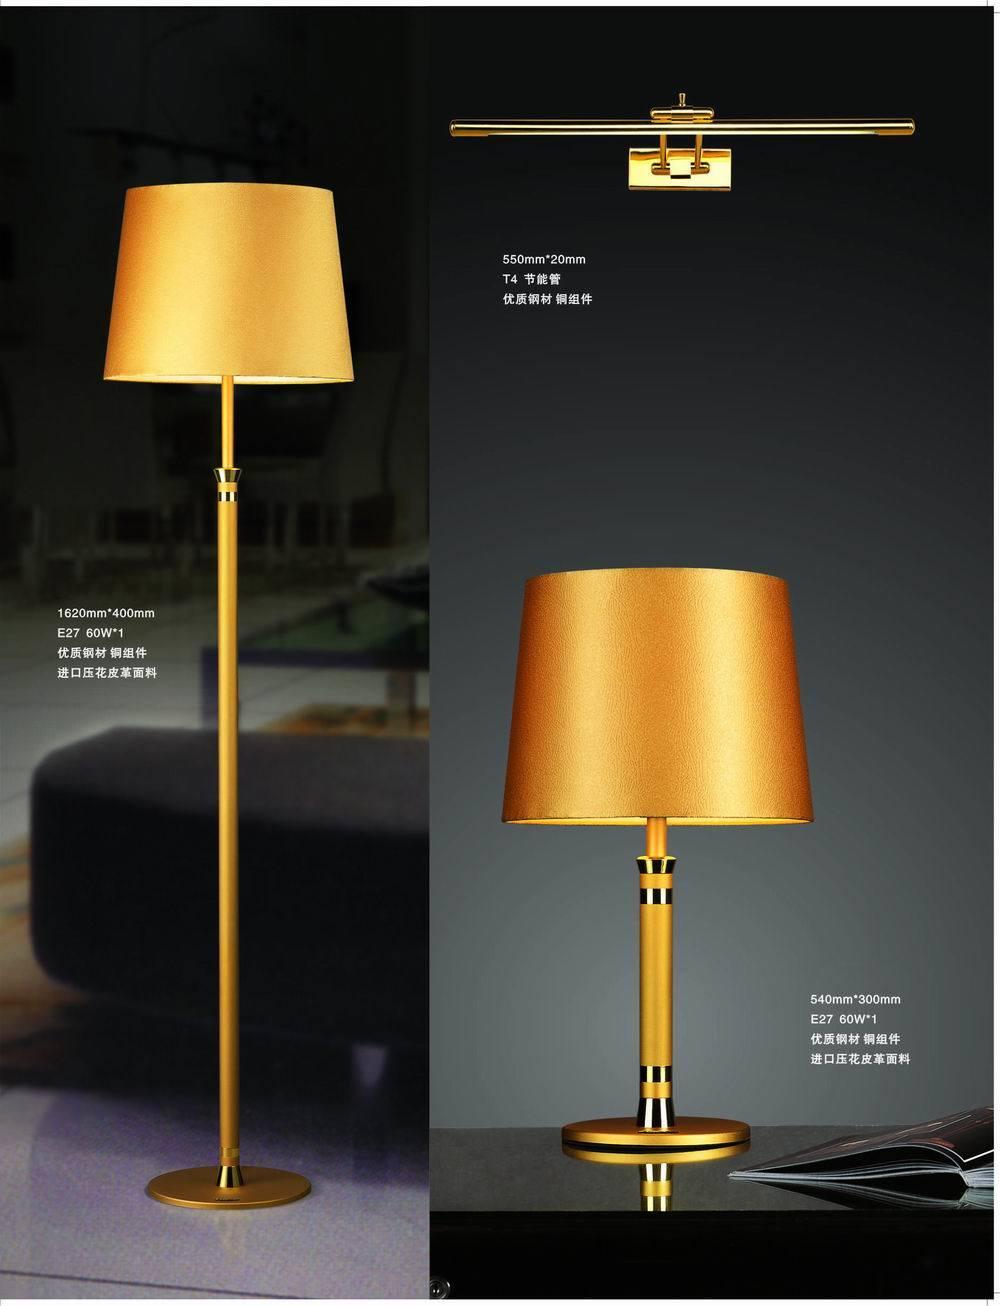 Clamp Desk Lamps December 2012